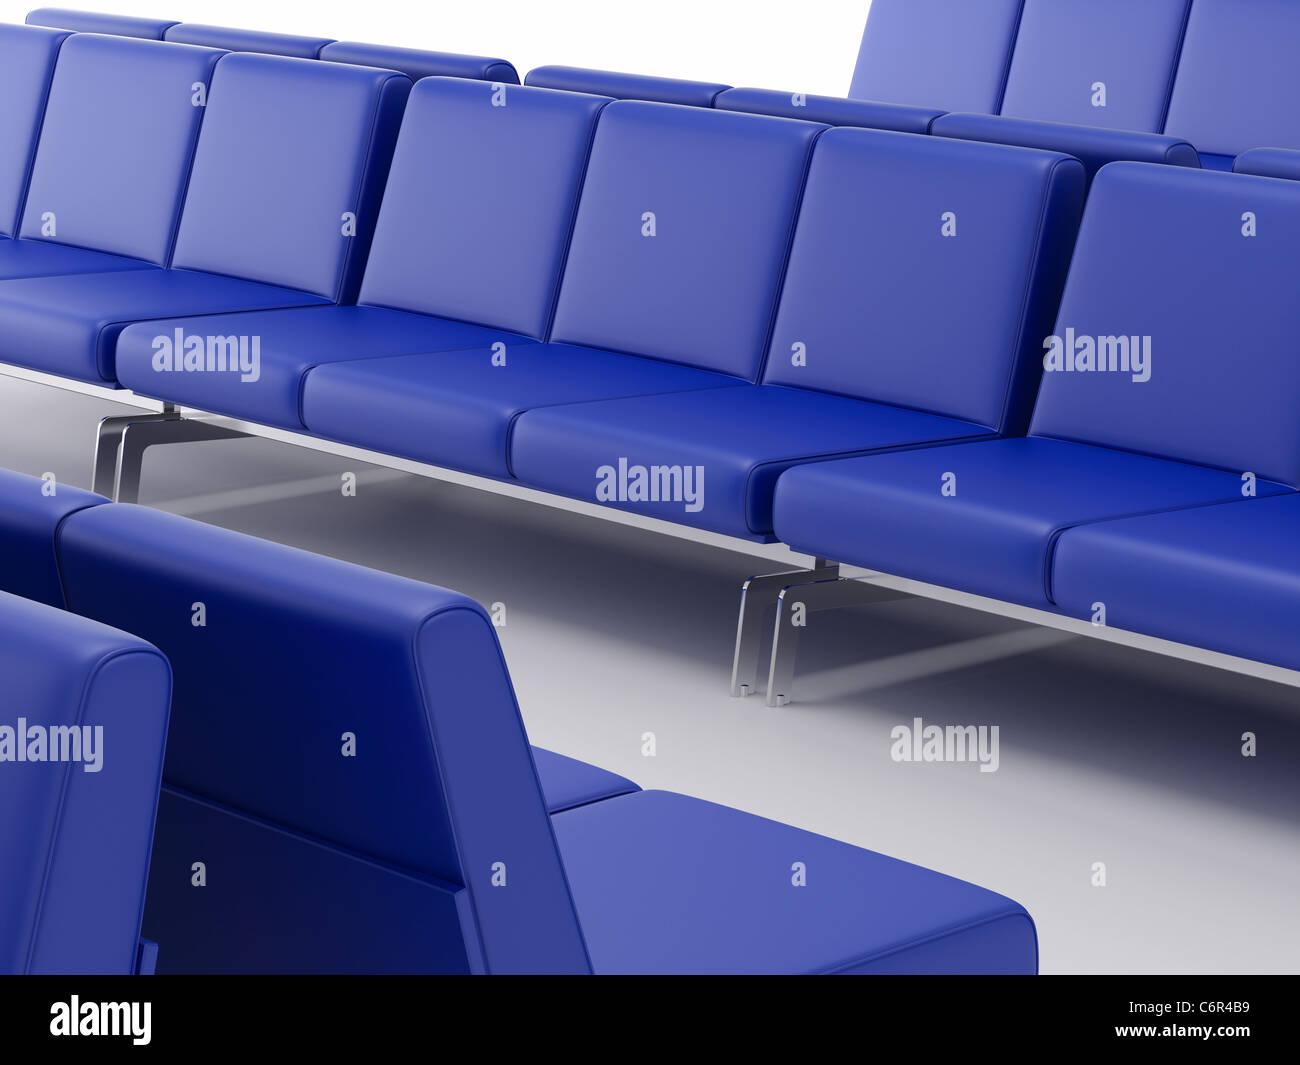 3d render airport interior high resolution image chair for High resolution interior images